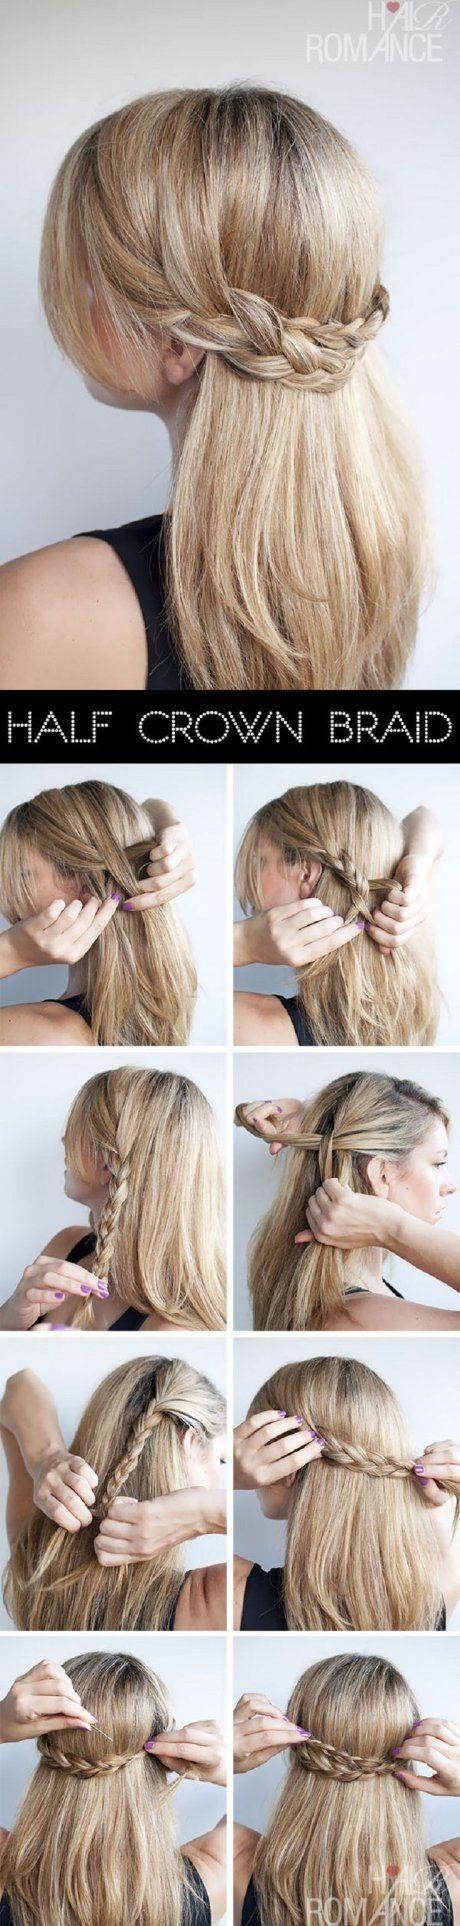 easy noheat hairstyles for dirty hair hair pinterest heat